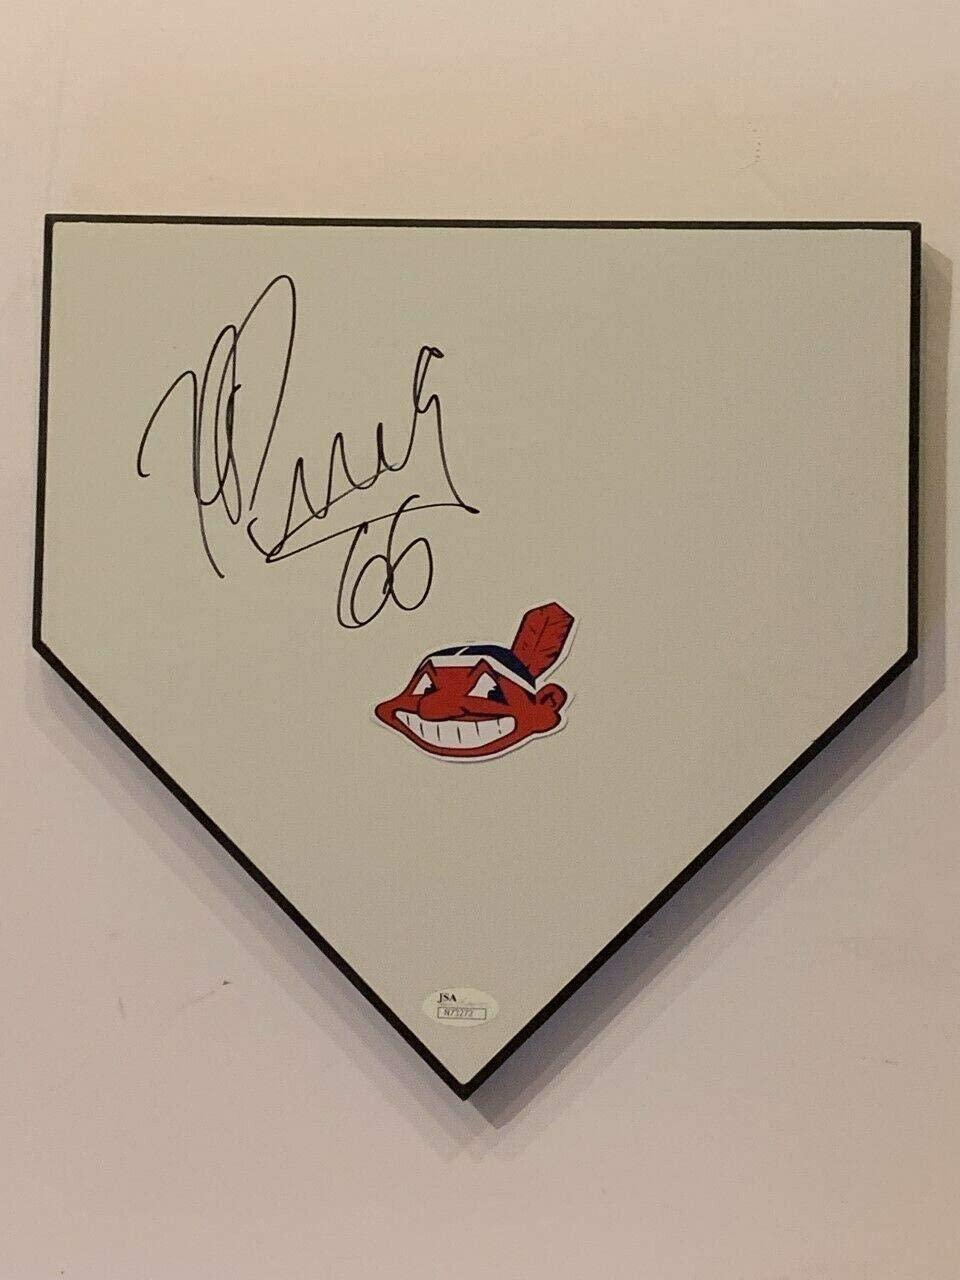 Yasiel Puig Signed Home Plate Indians Full Signature Jsa Coa - MLB Game Used Bases